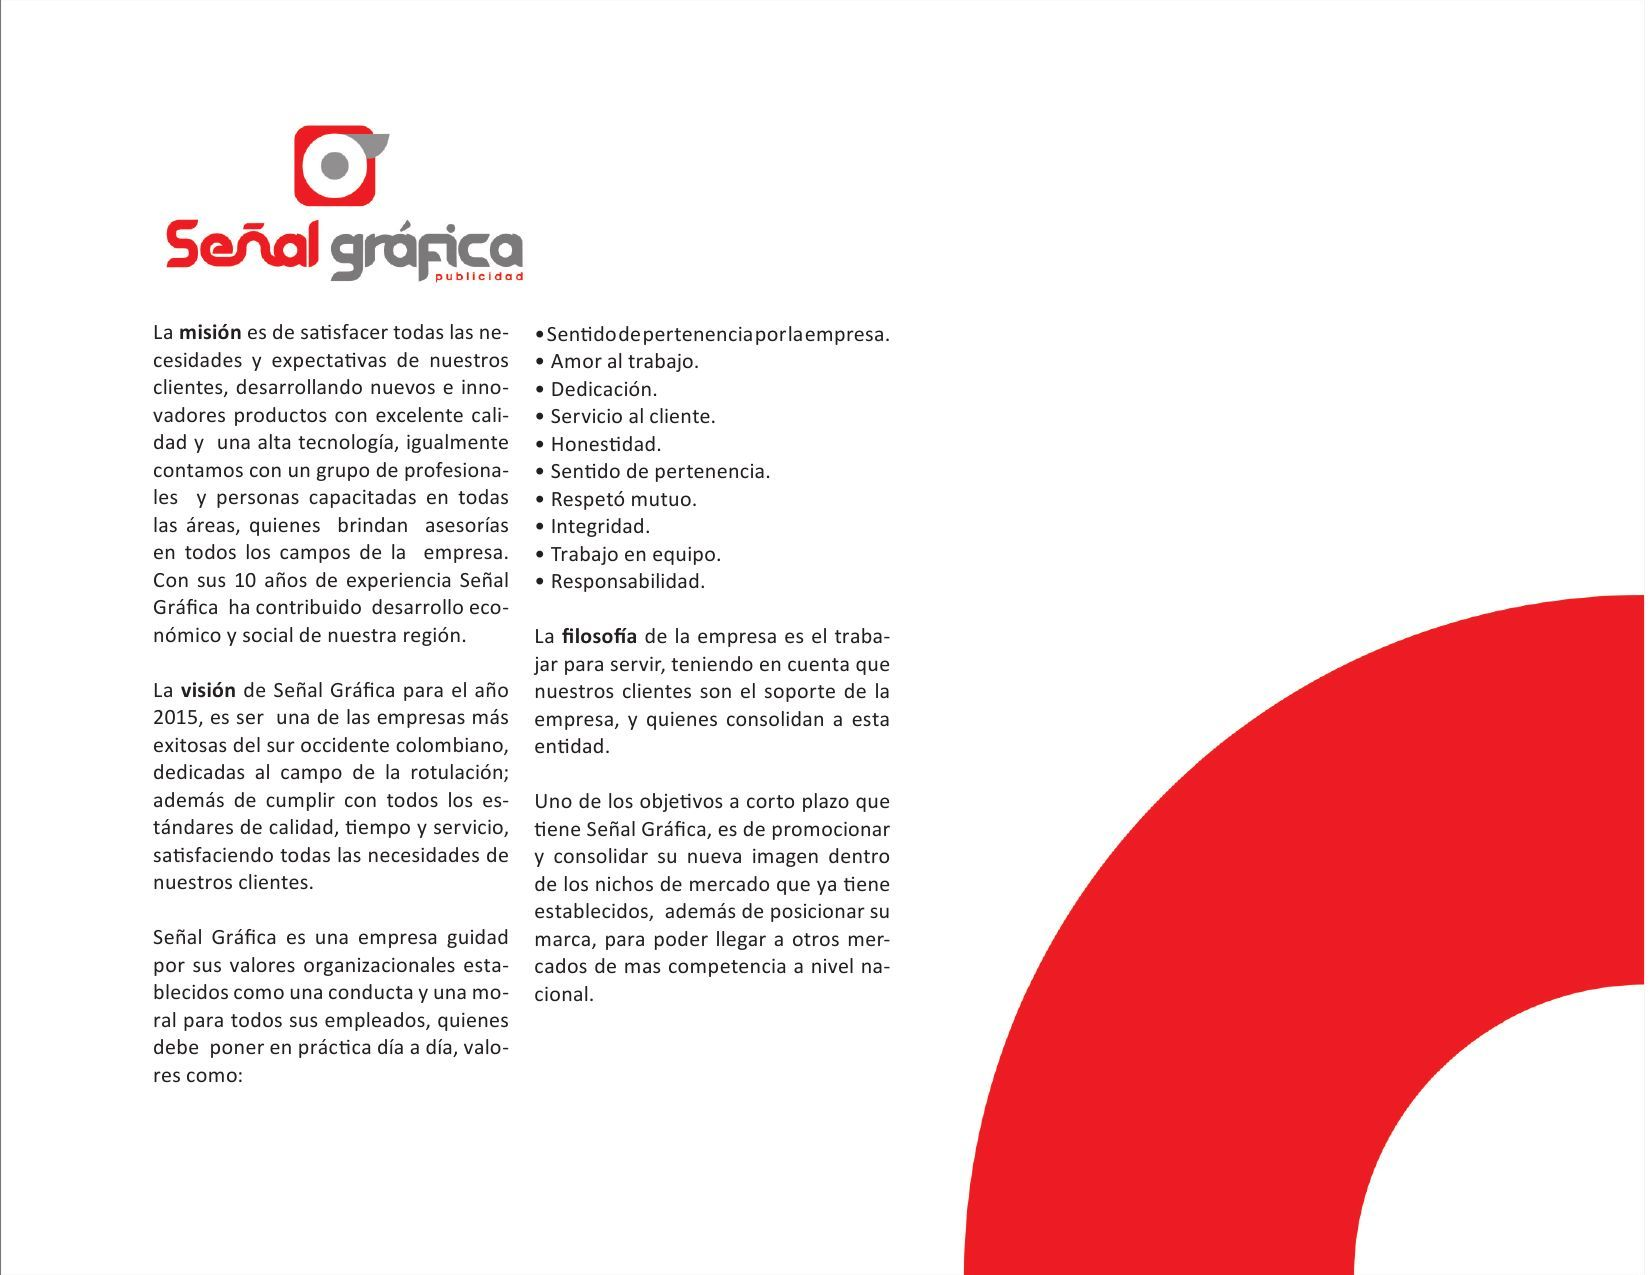 ISSUU - manual de identidada corporativa señal grafica de Stiven bastidas